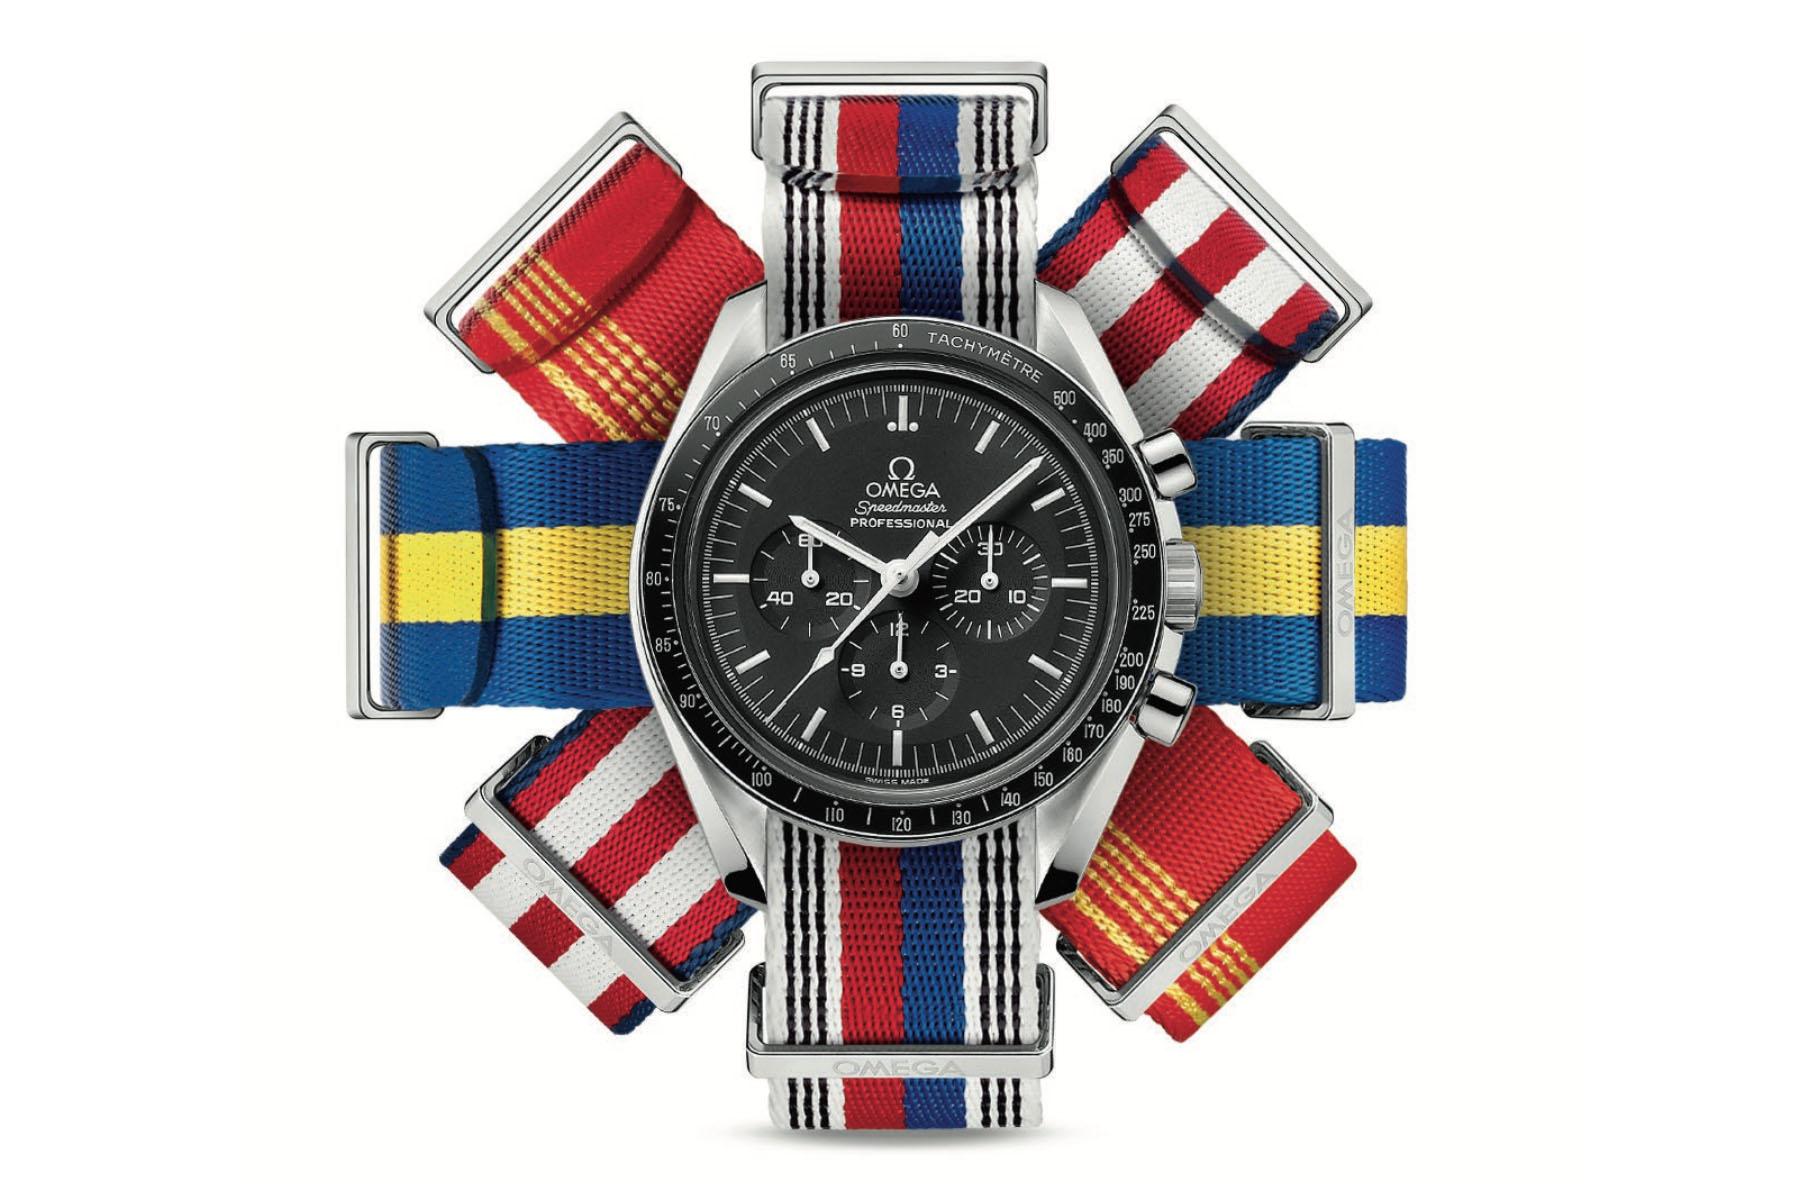 Omega NATO straps Olympic Games